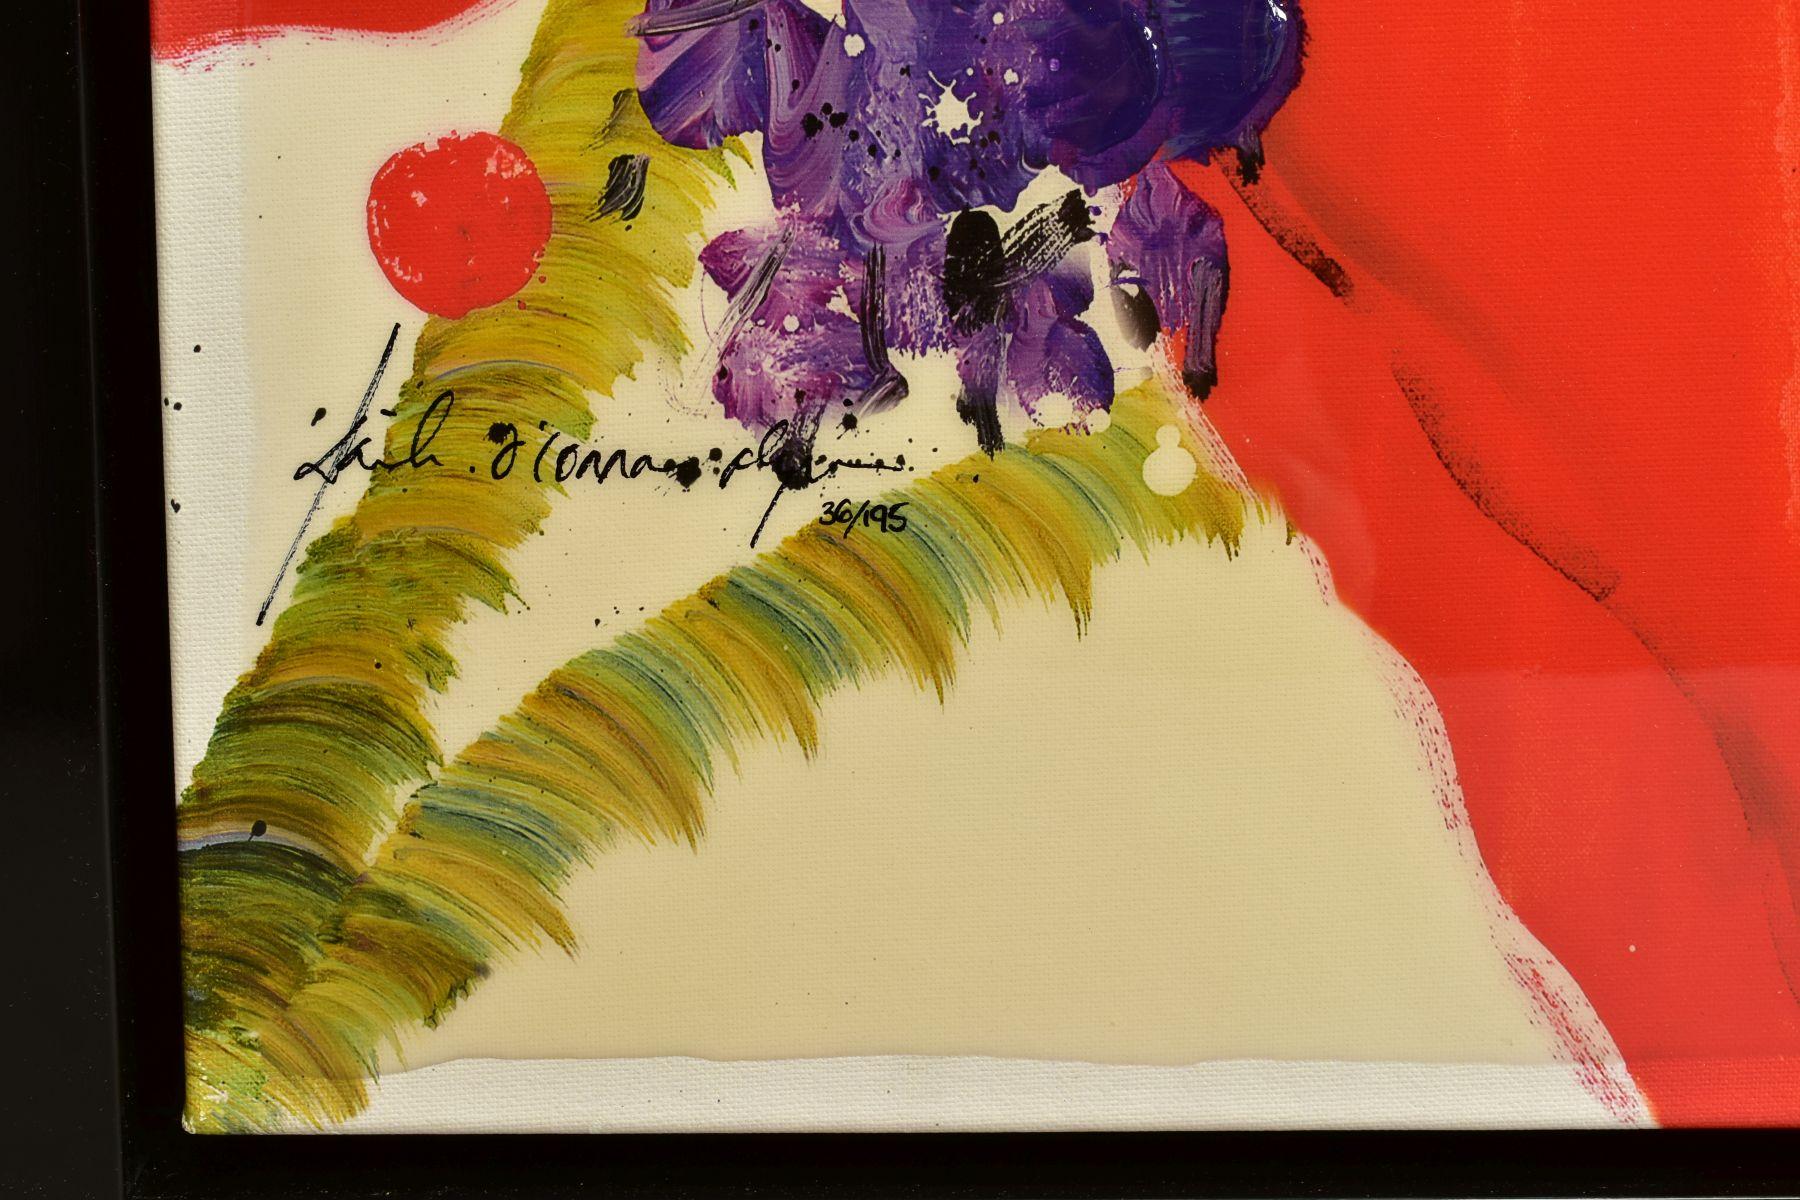 DANIELLE O'CONNOR AKIYAMA (CANADA 1957), 'Journey I', a Limited Edition print of blossom, 36/195, - Image 3 of 5